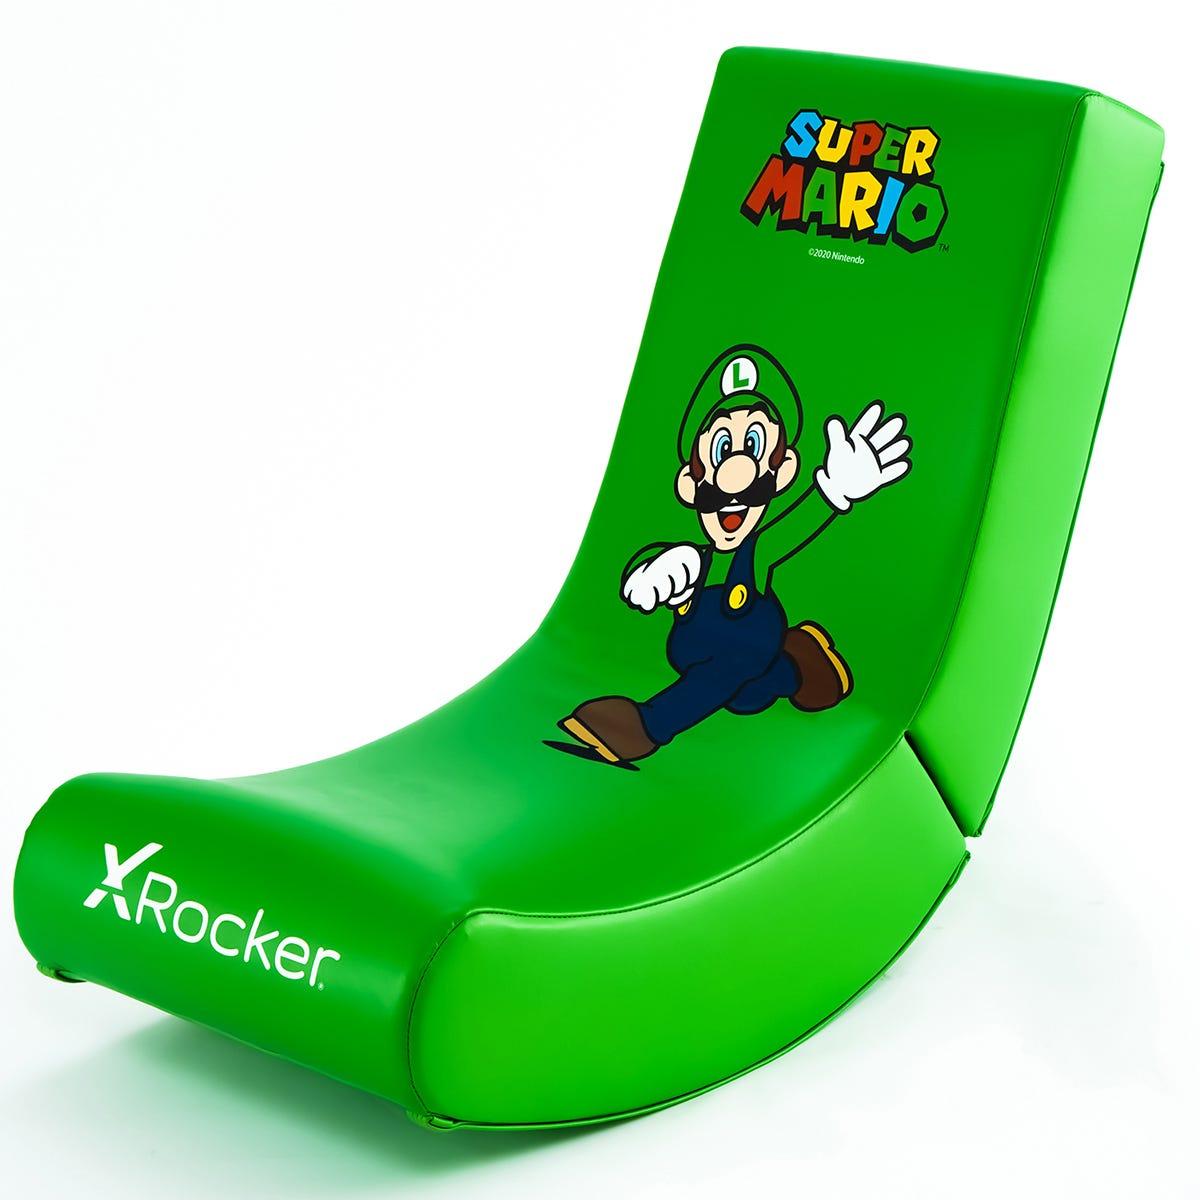 X Rocker X-Rocker Nintendo Video Rocker Foldable Gaming Chair - Official Super Mario Bros - Luigi Jump